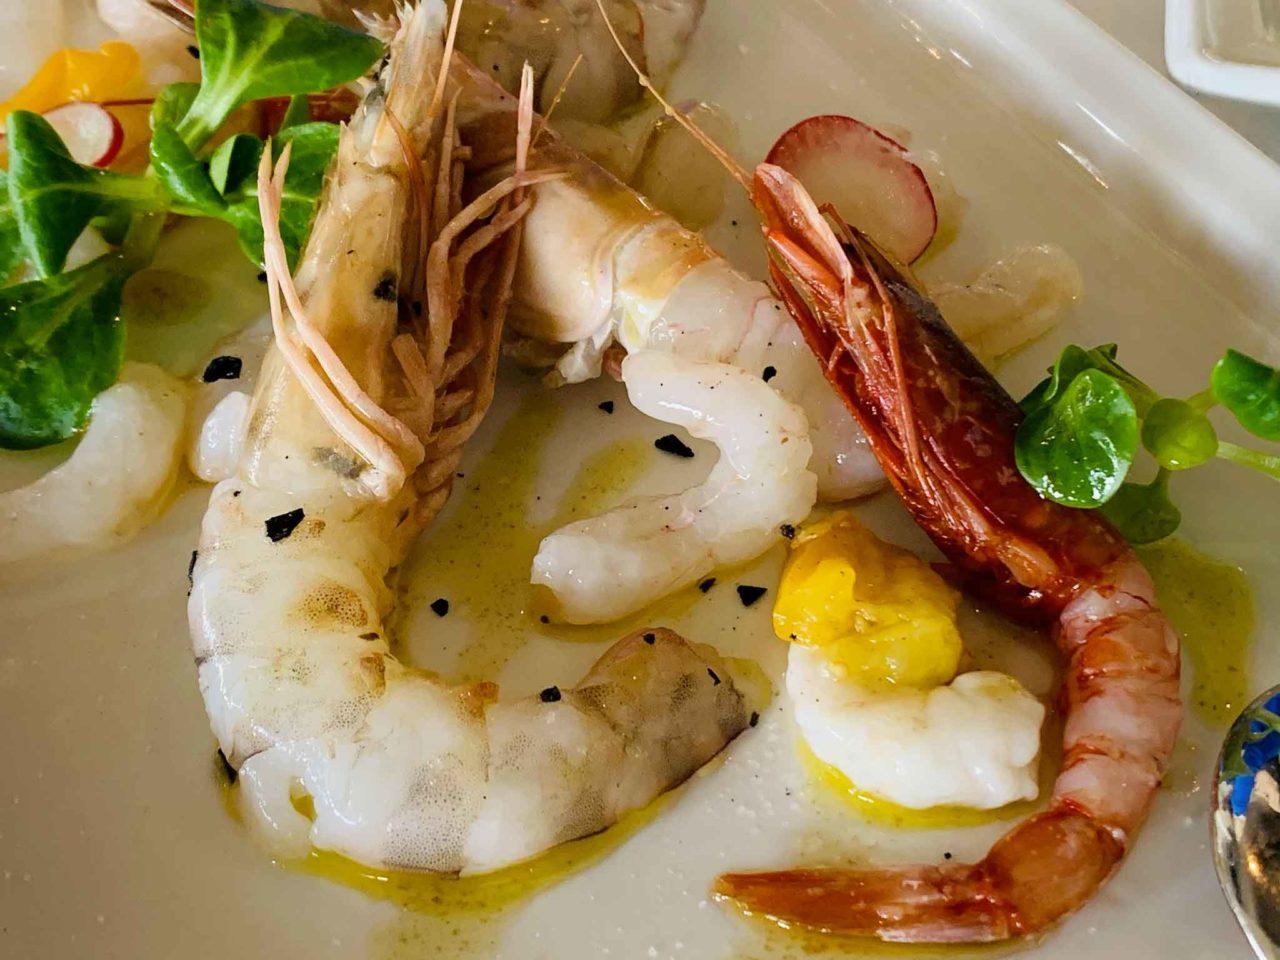 La Zattera ristorante di pesce Pescara crudi